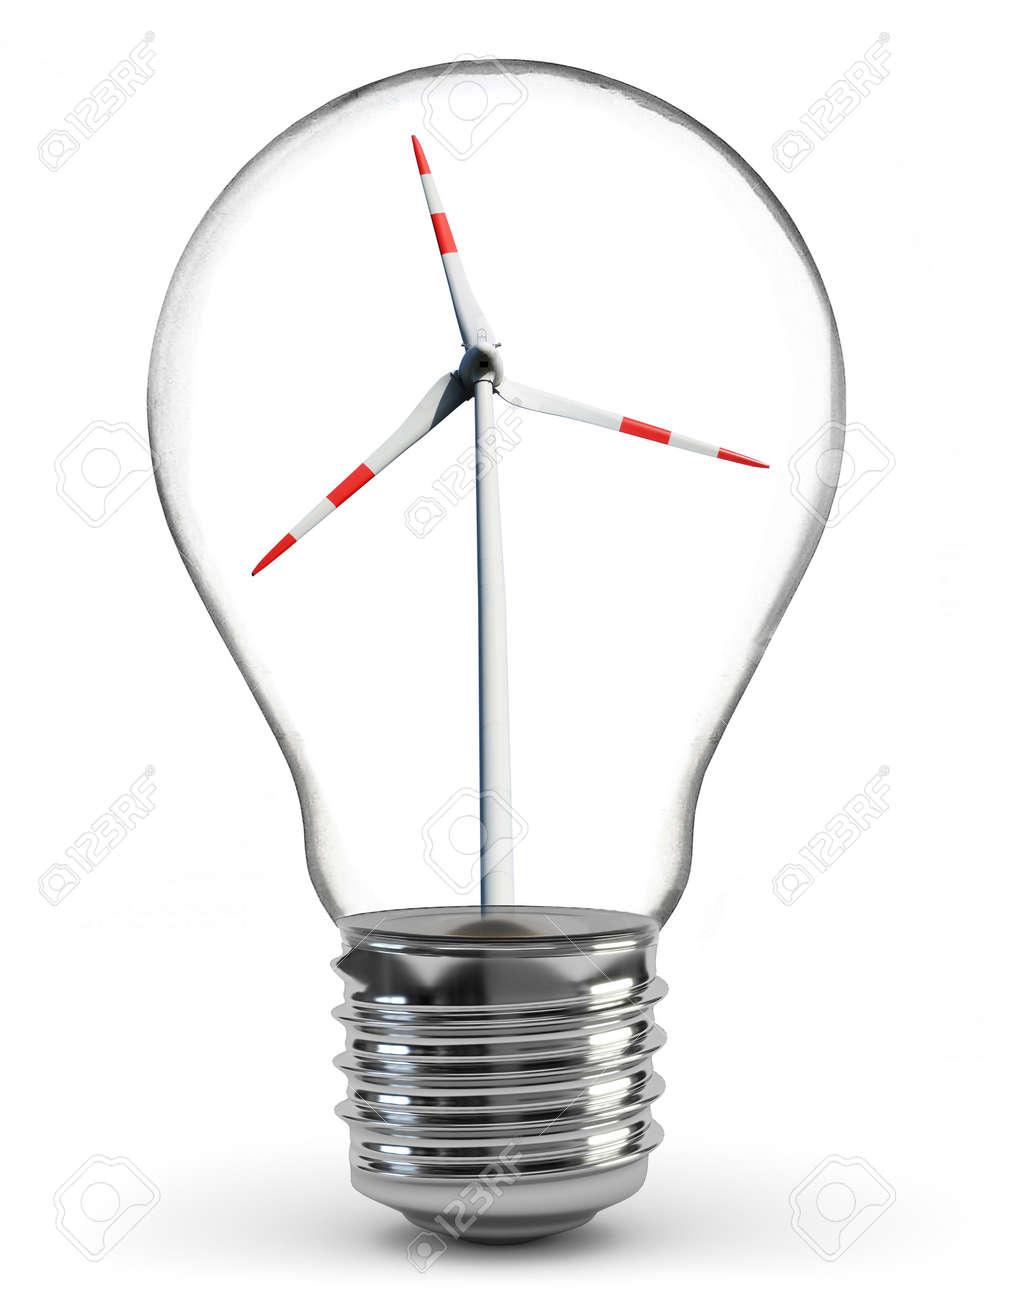 windmill generators inside light bulb over white stock photo